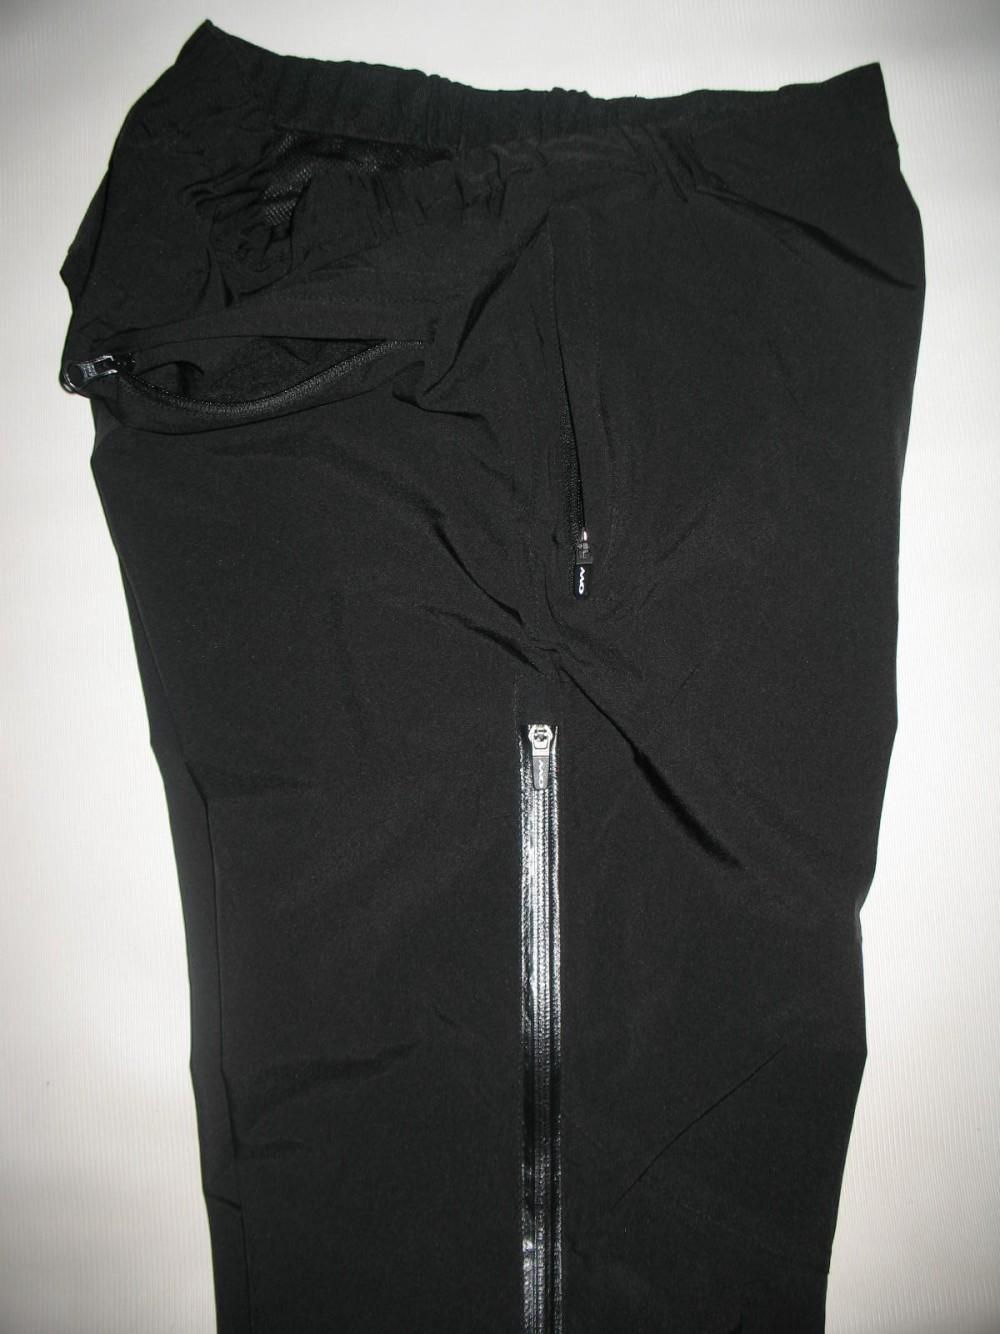 Штаны OW(ONE WAY) trekking pants (размер M) - 5